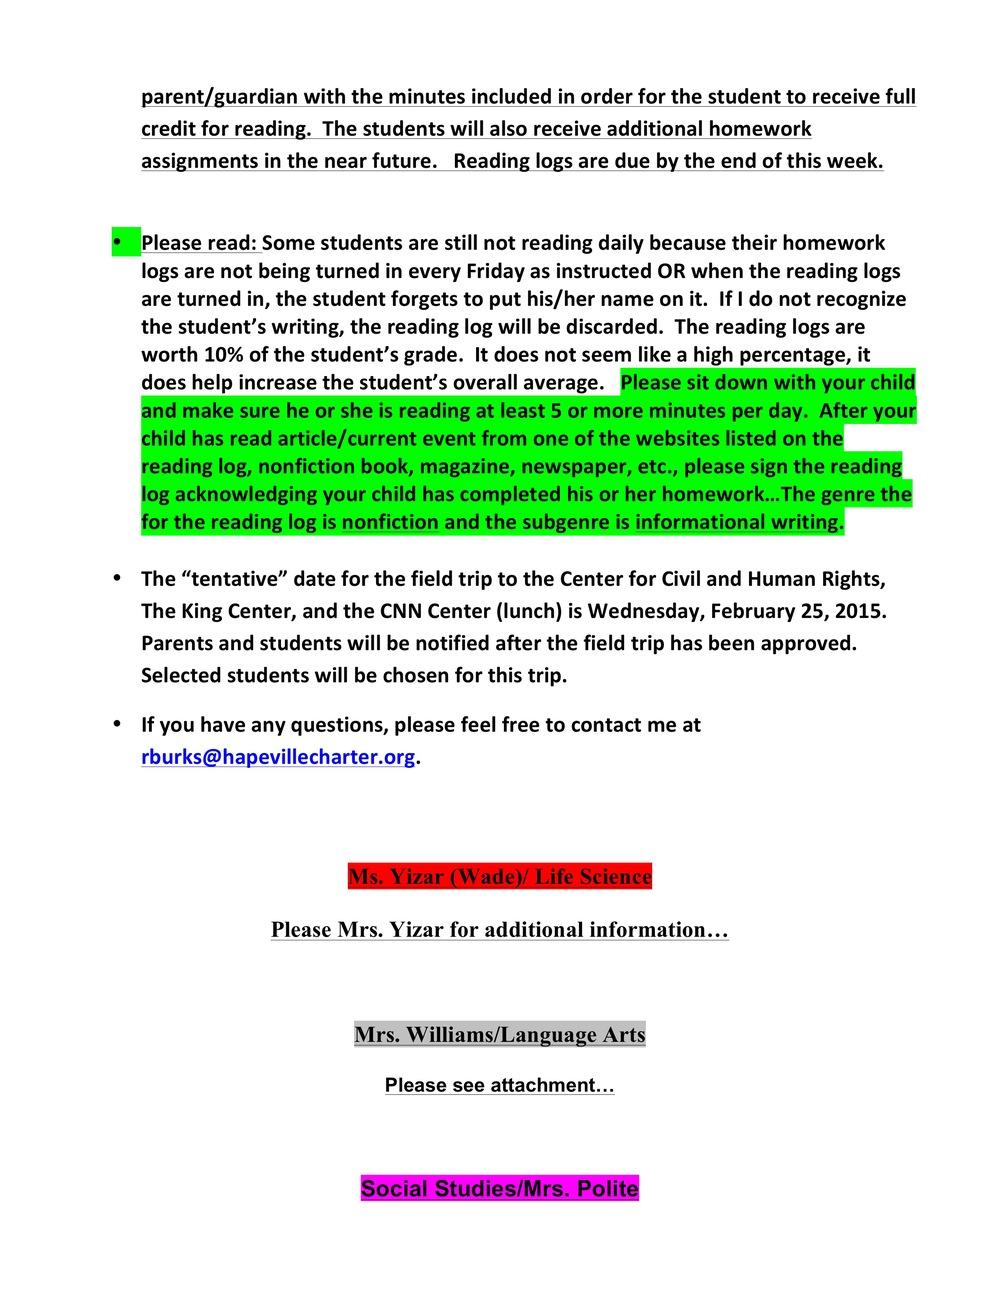 Newsletter Image7th grade January 26, 2015 3.jpeg